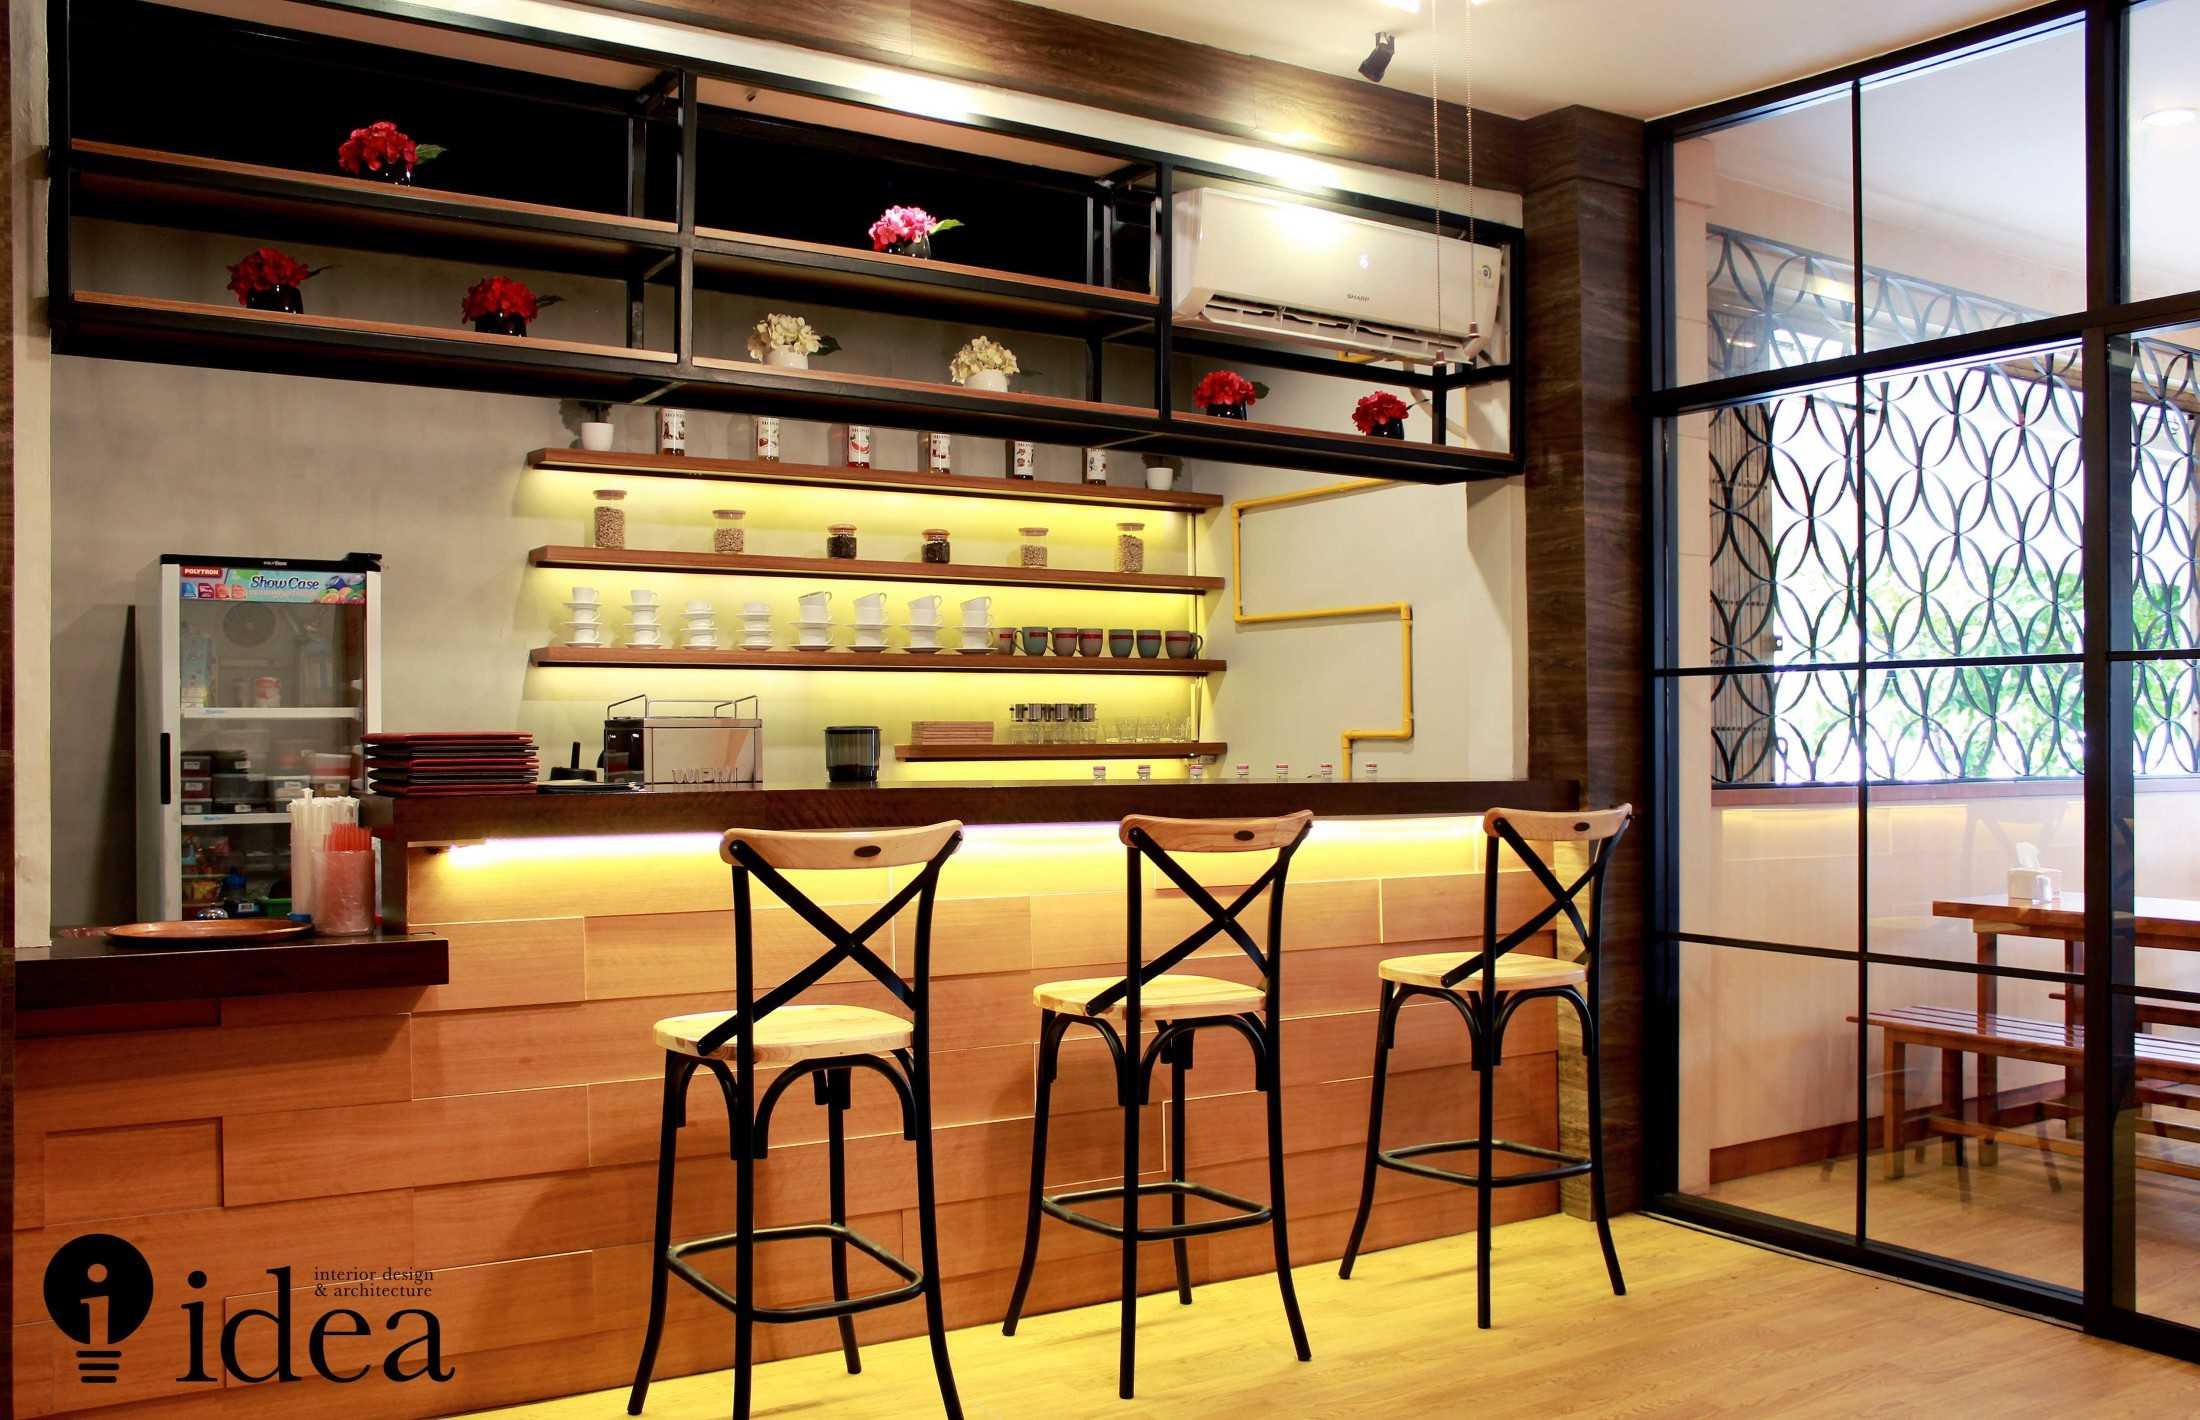 Idea Studio Coffee Bar - Nyonya Attha Surabaya, Kota Sby, Jawa Timur, Indonesia Surabaya, Kota Sby, Jawa Timur, Indonesia Idea-Studio-Coffee-Bar-Nyonya-Attha  79938